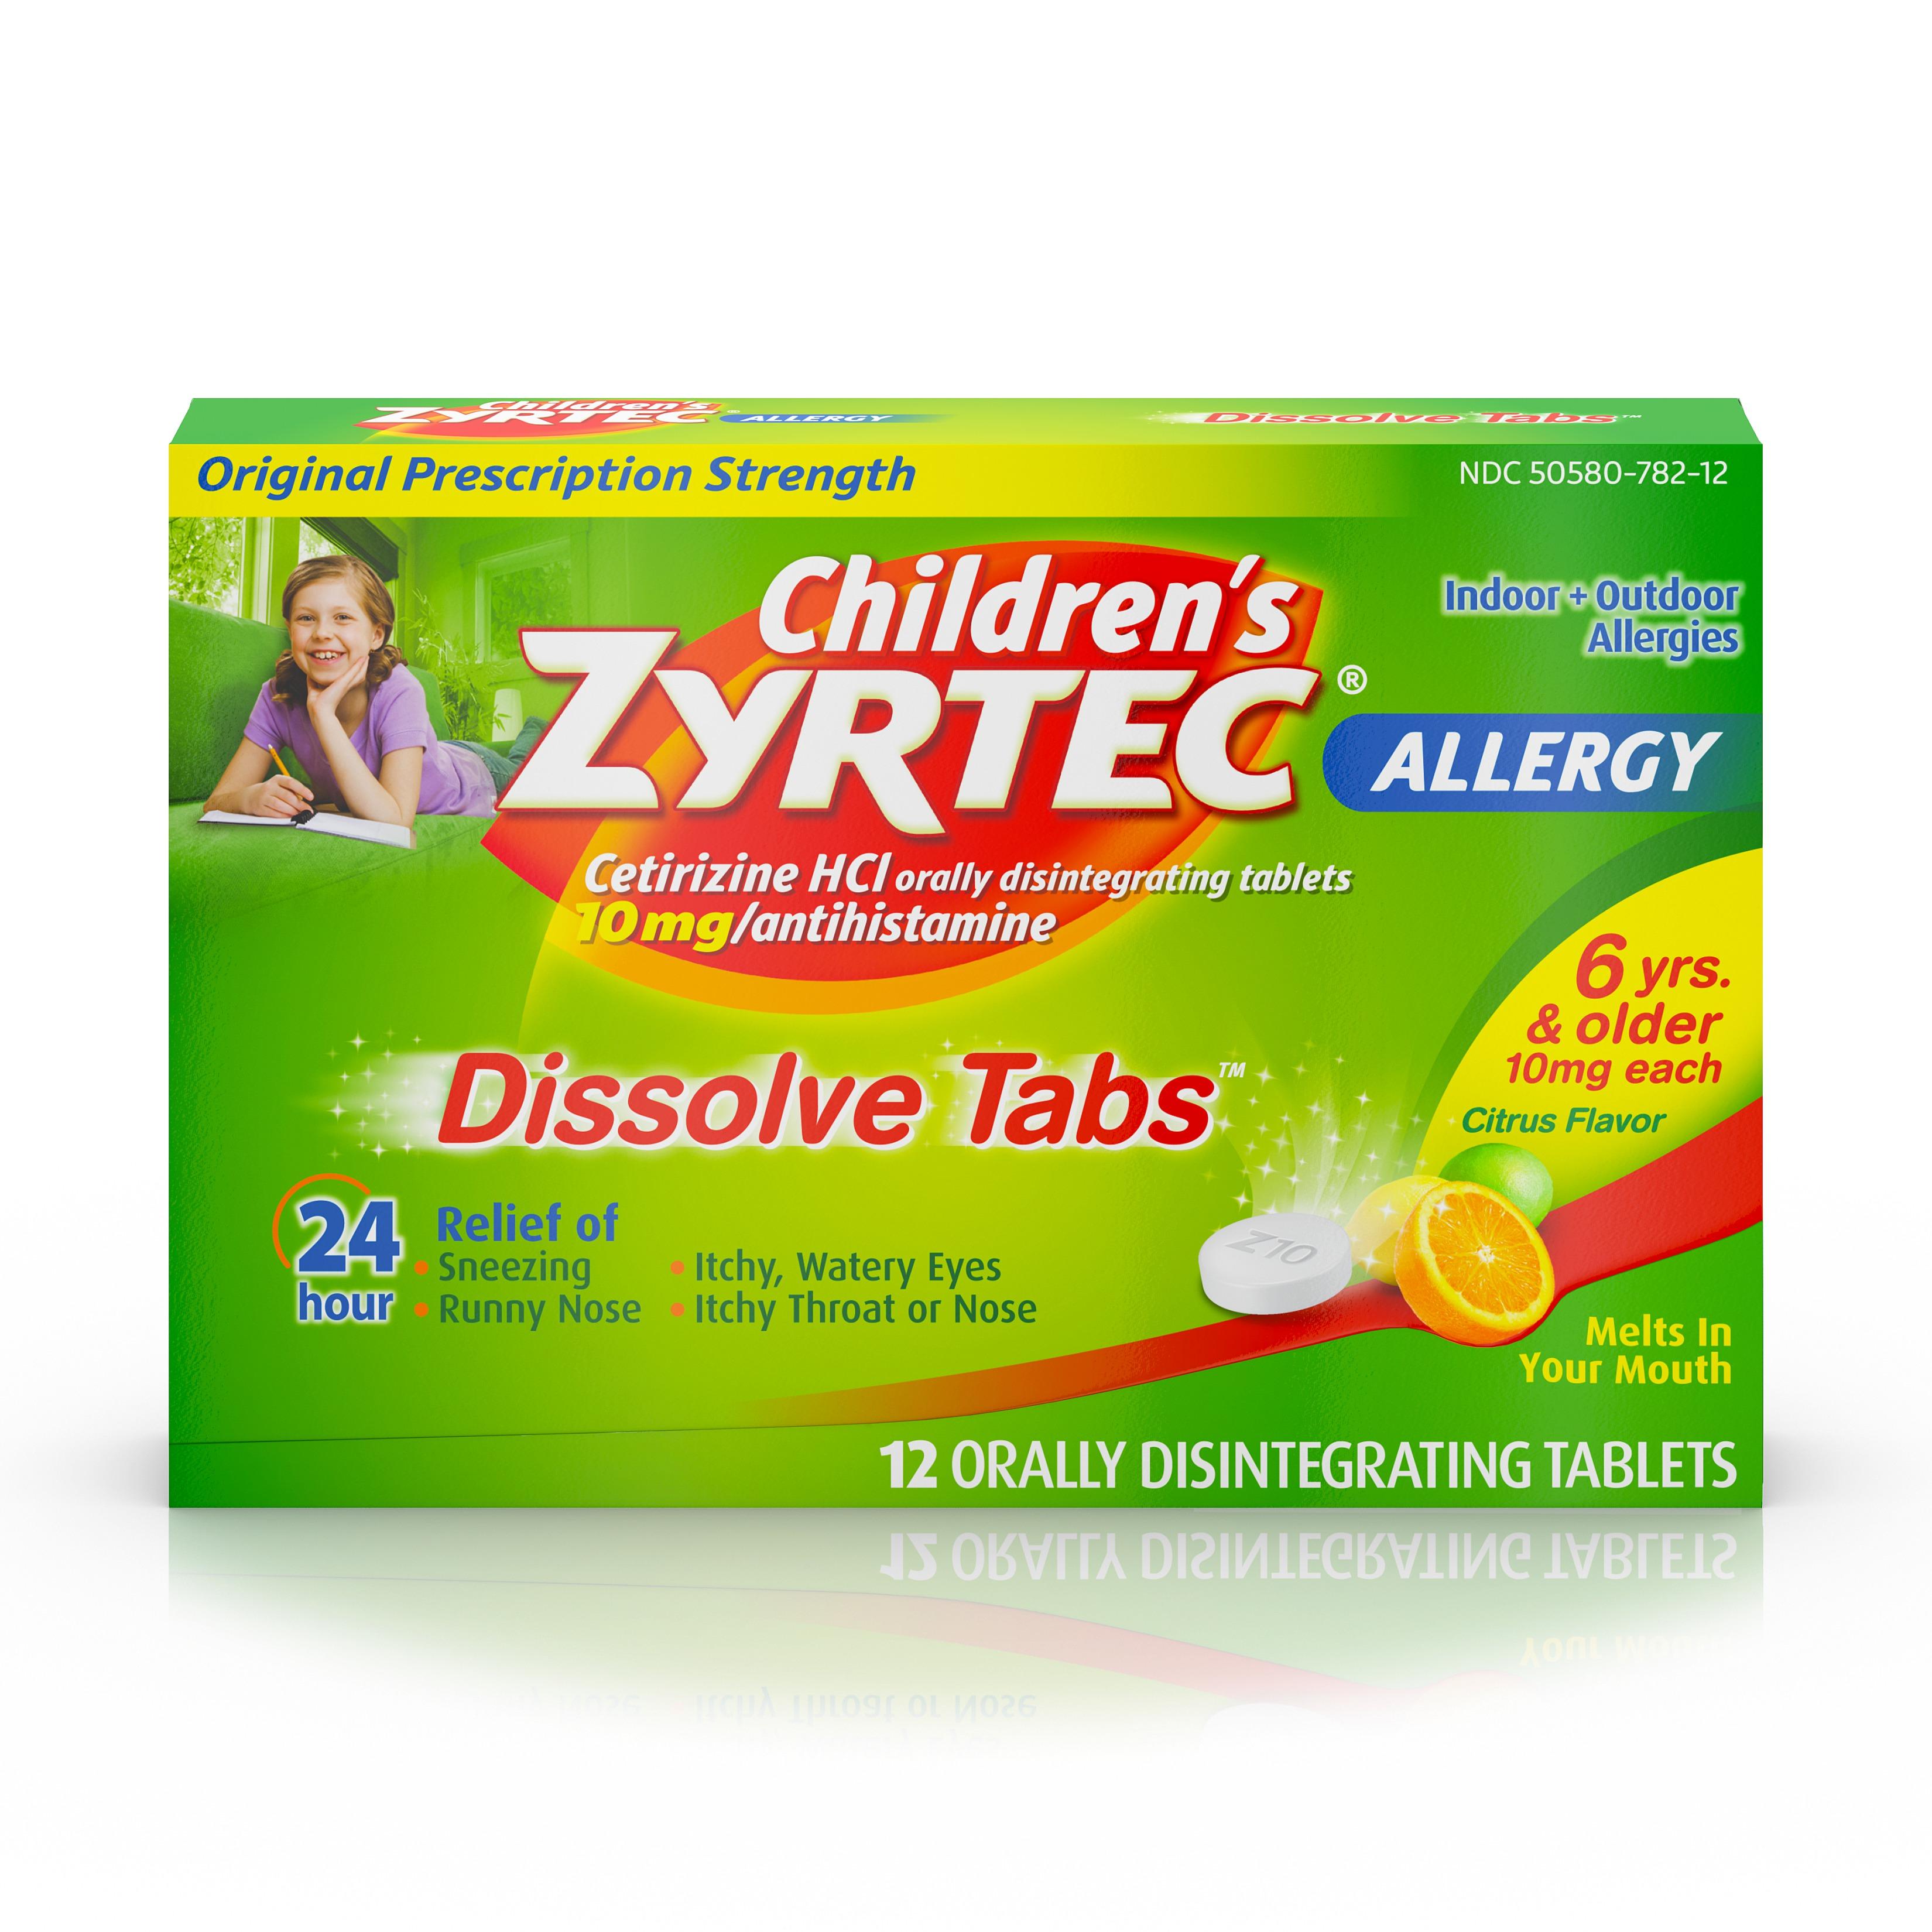 Children's Zyrtec 24 Hr Allergy Dissolve Tablets, Citrus Flavor, 12 ct